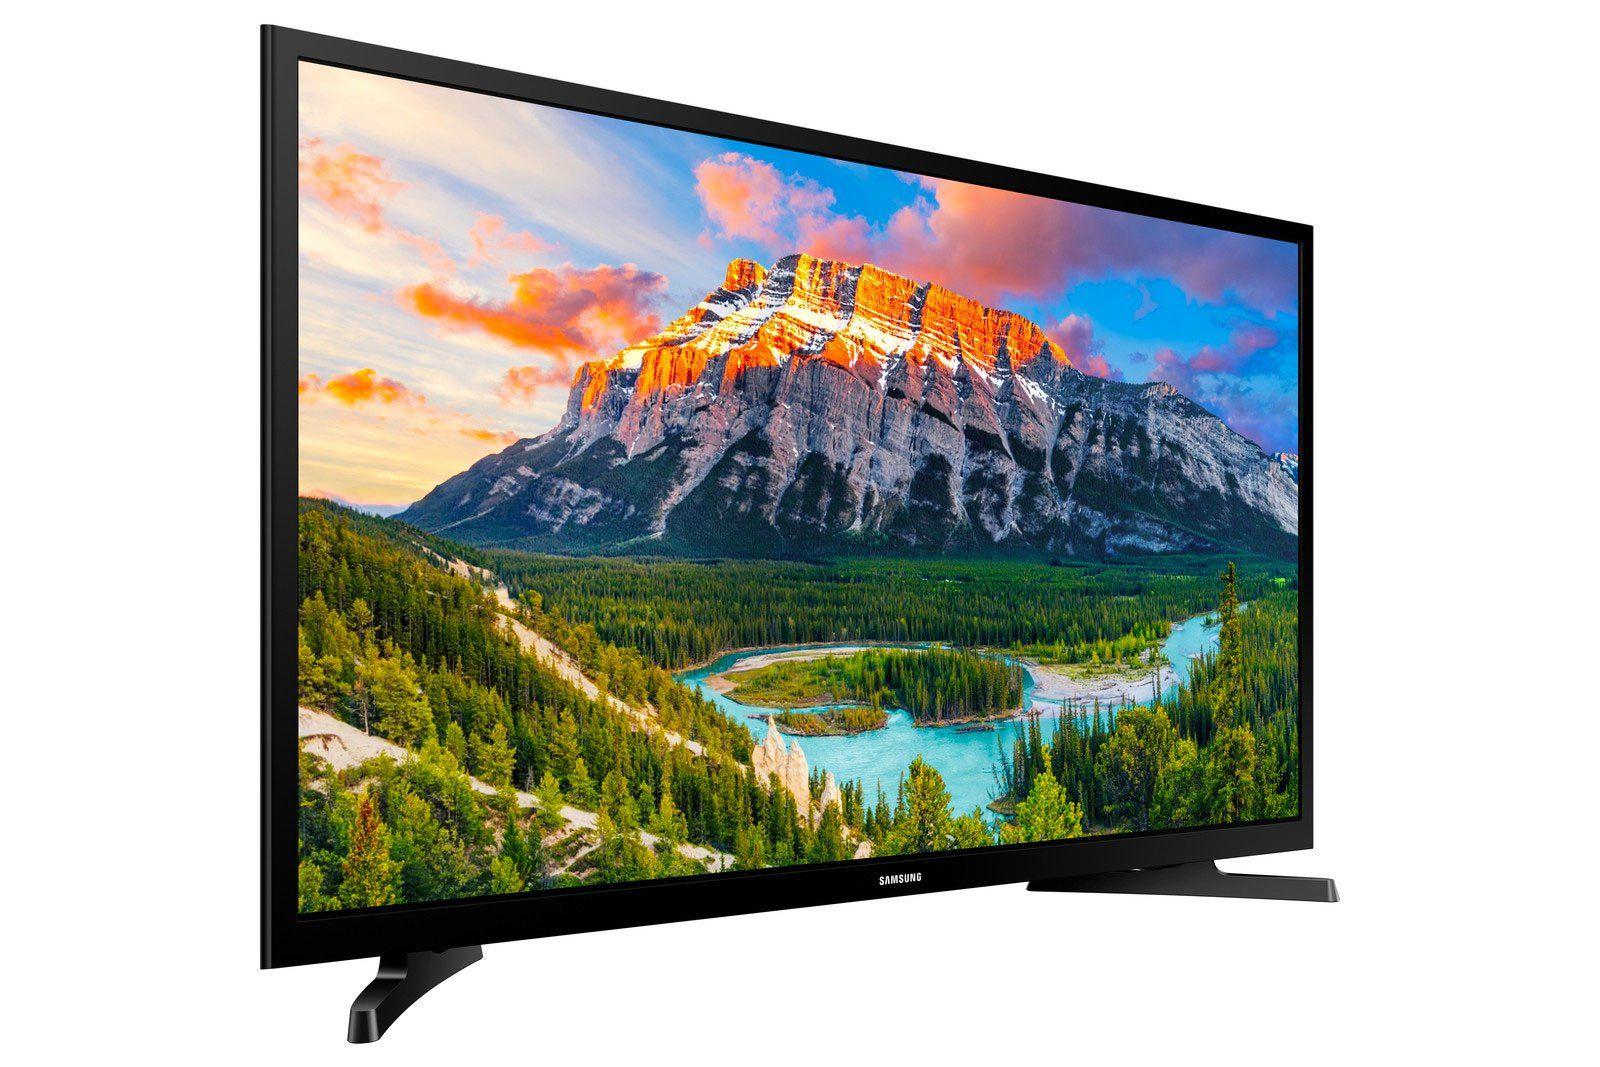 Samsung N5300 32 Inch Full Hd Smart Tv Smart Tv Led Tv Samsung Smart Tv Samsung 32 class led n5300 series 1080p